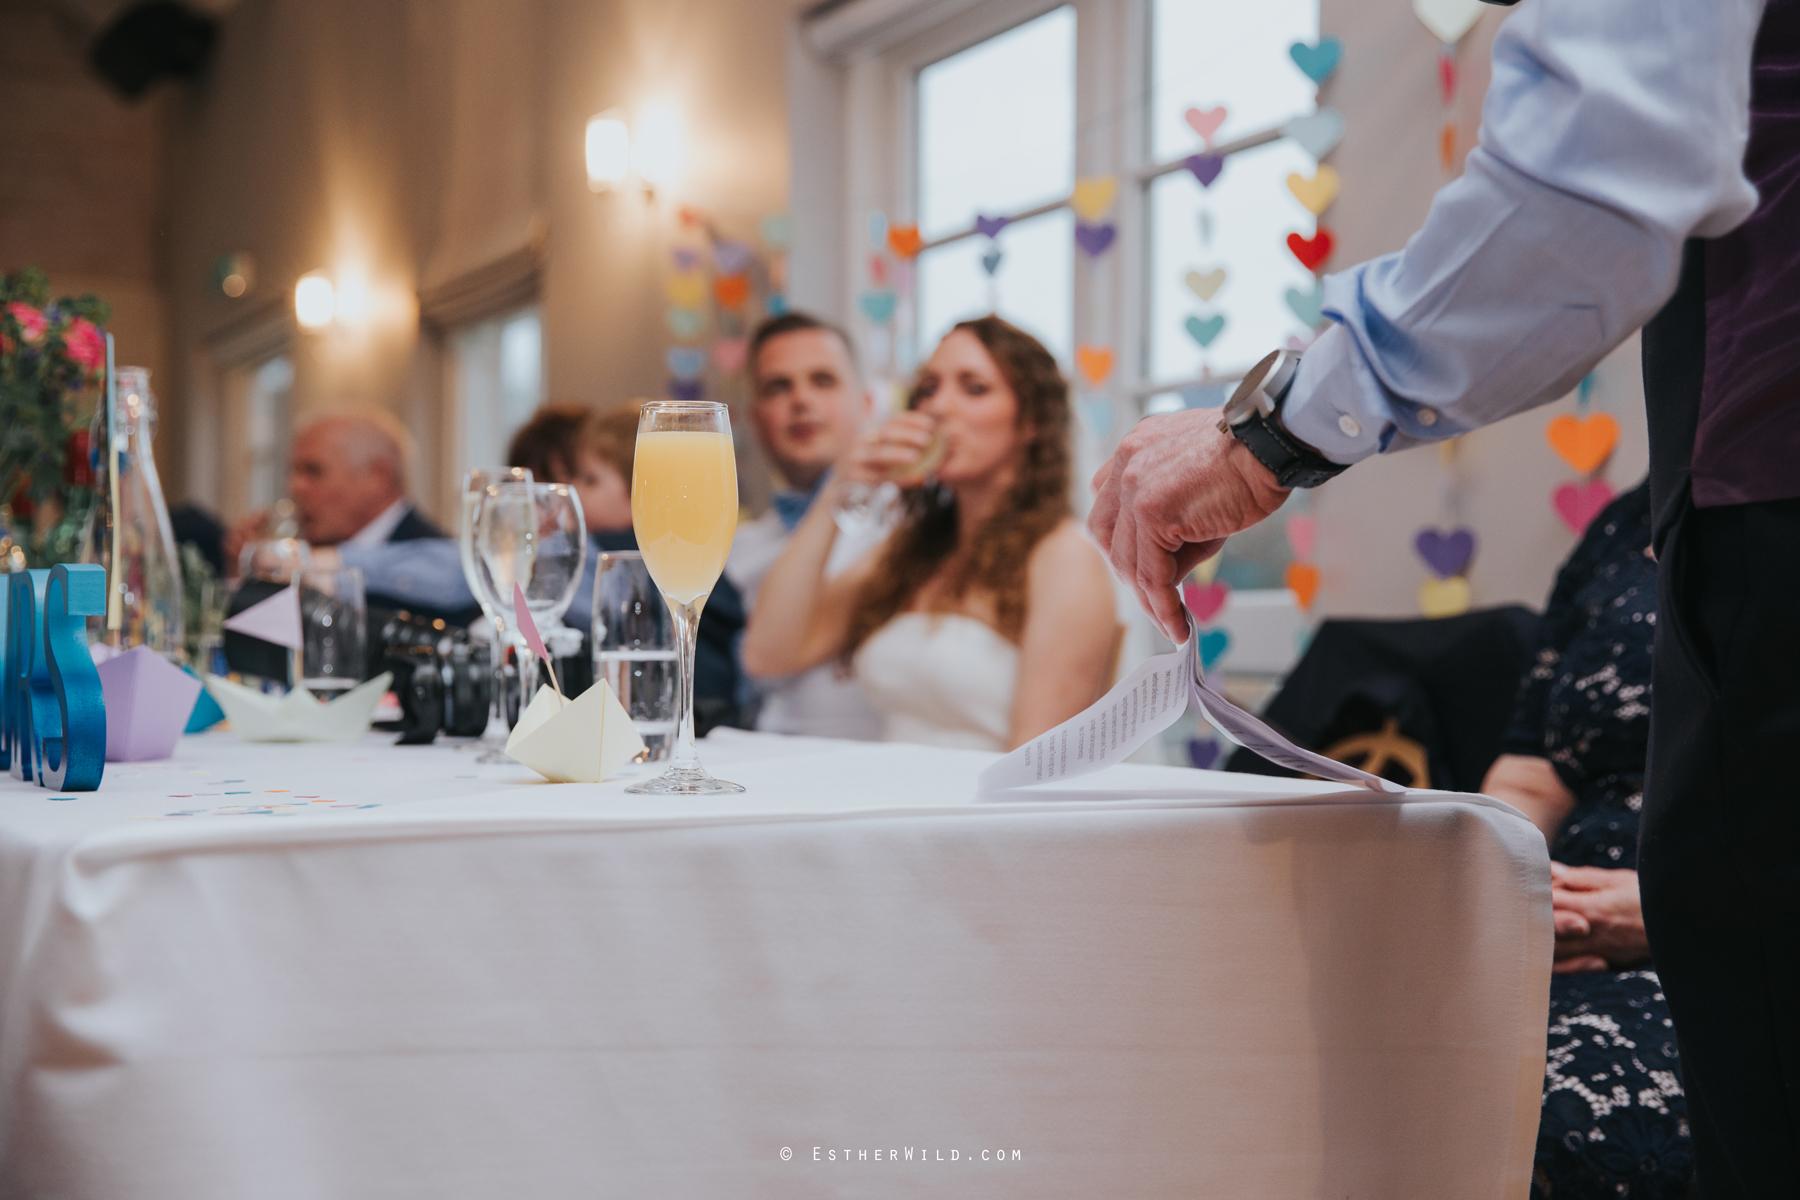 The_BoatHouse_Wedding_Venue_Ormesby_Norfolk_Broads_Boat_Wedding_Photography_Esther_Wild_Photographer_IMG_3066.jpg